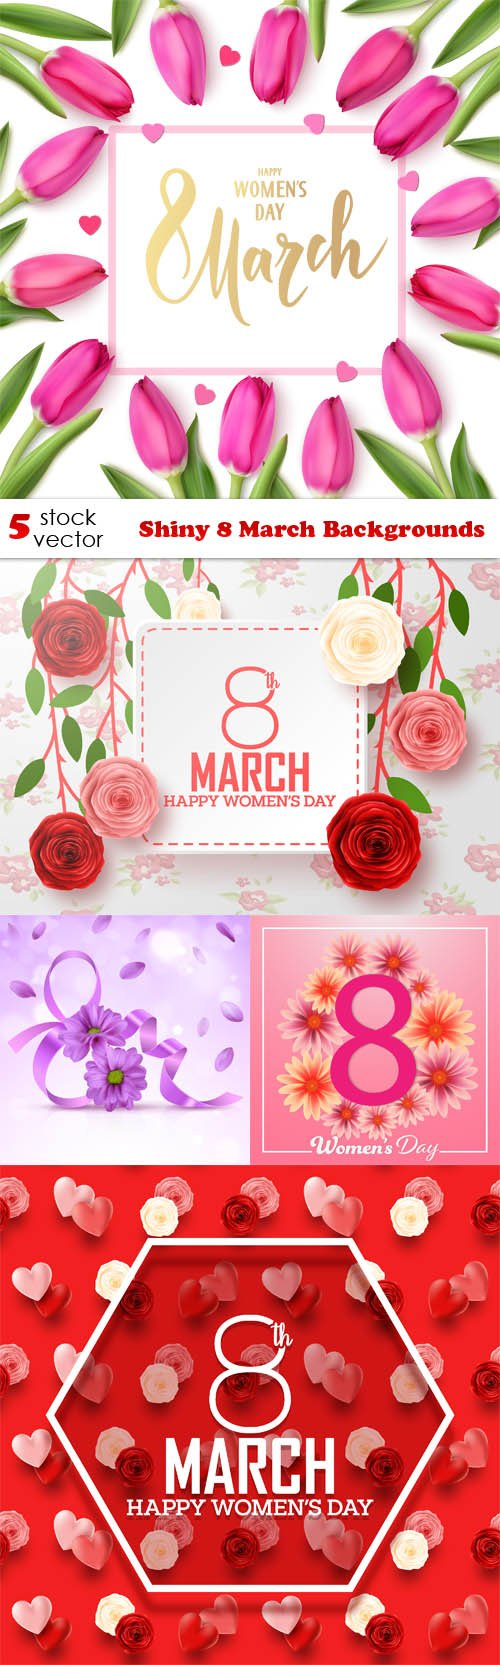 Vectors - Shiny 8 March Backgrounds